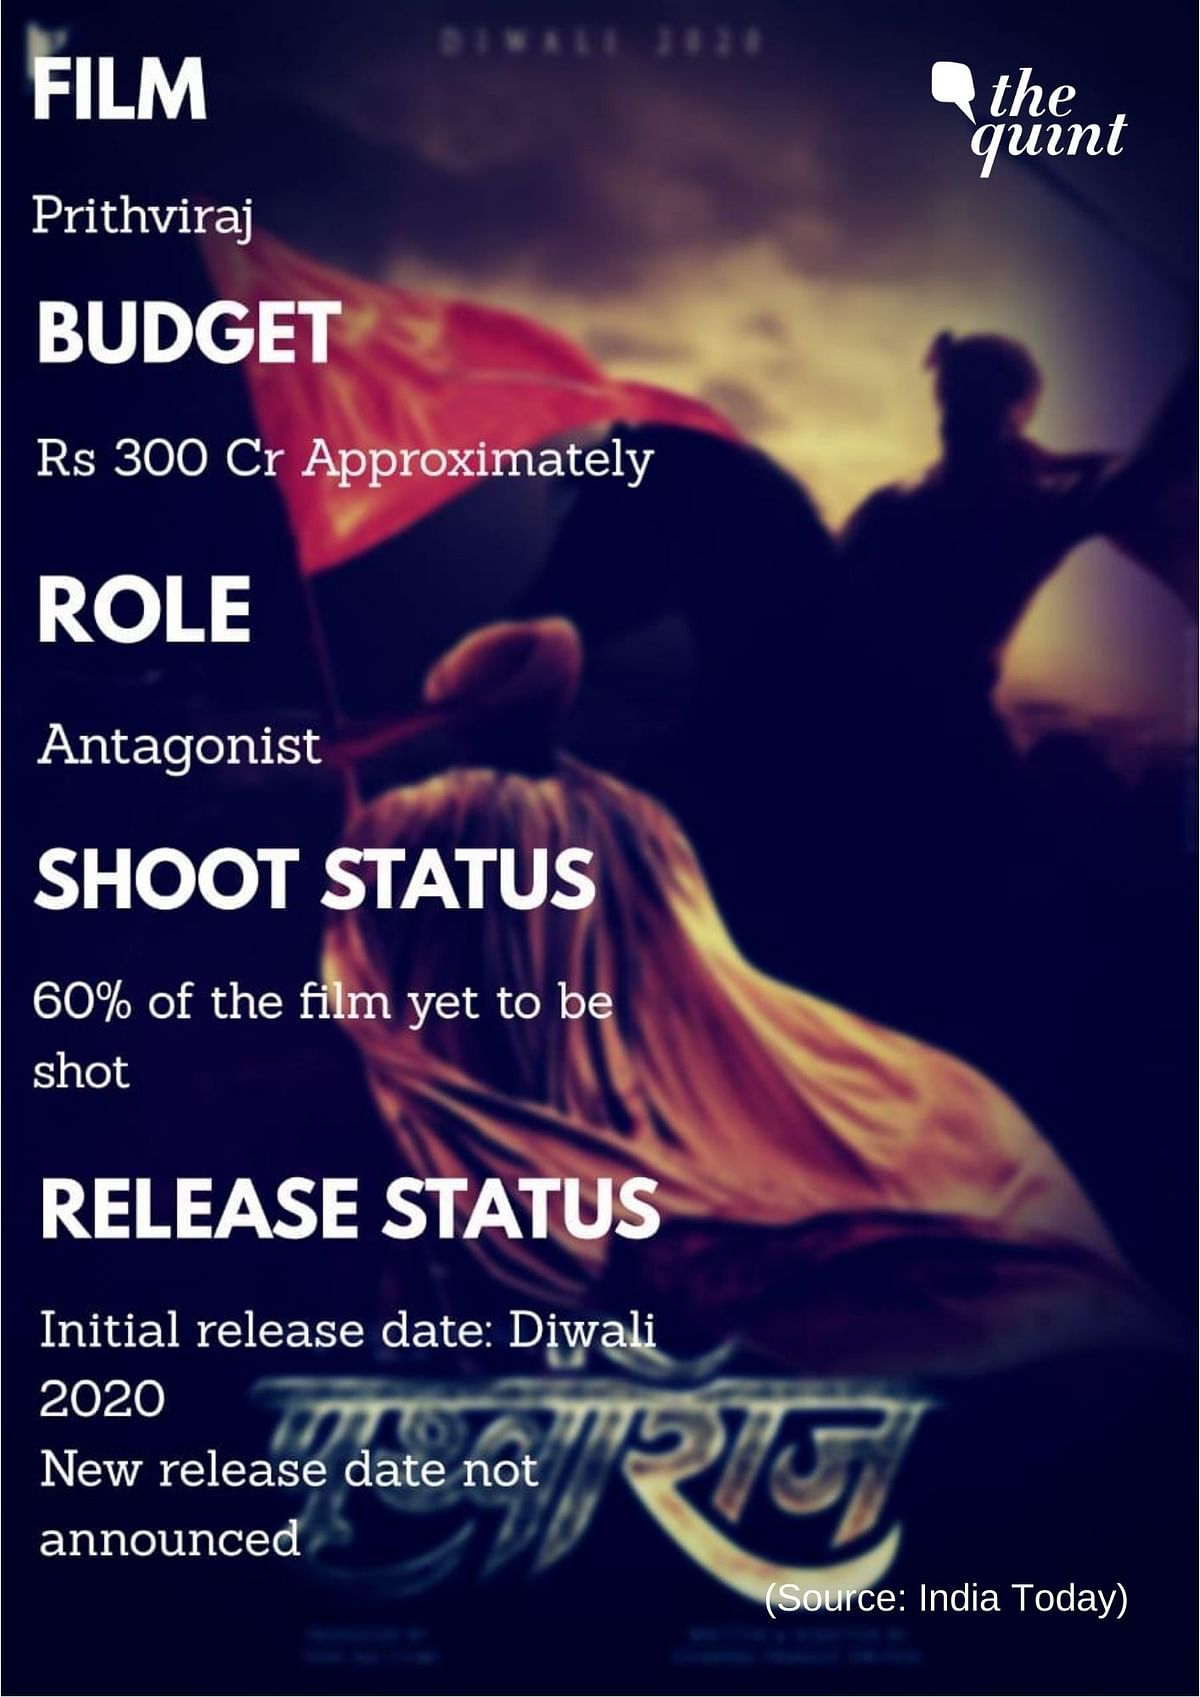 <i>Prithvira</i>j starring Akshay Kumar, Sanjay Dutt and Manushi Chillar still has 60% of shoot left.